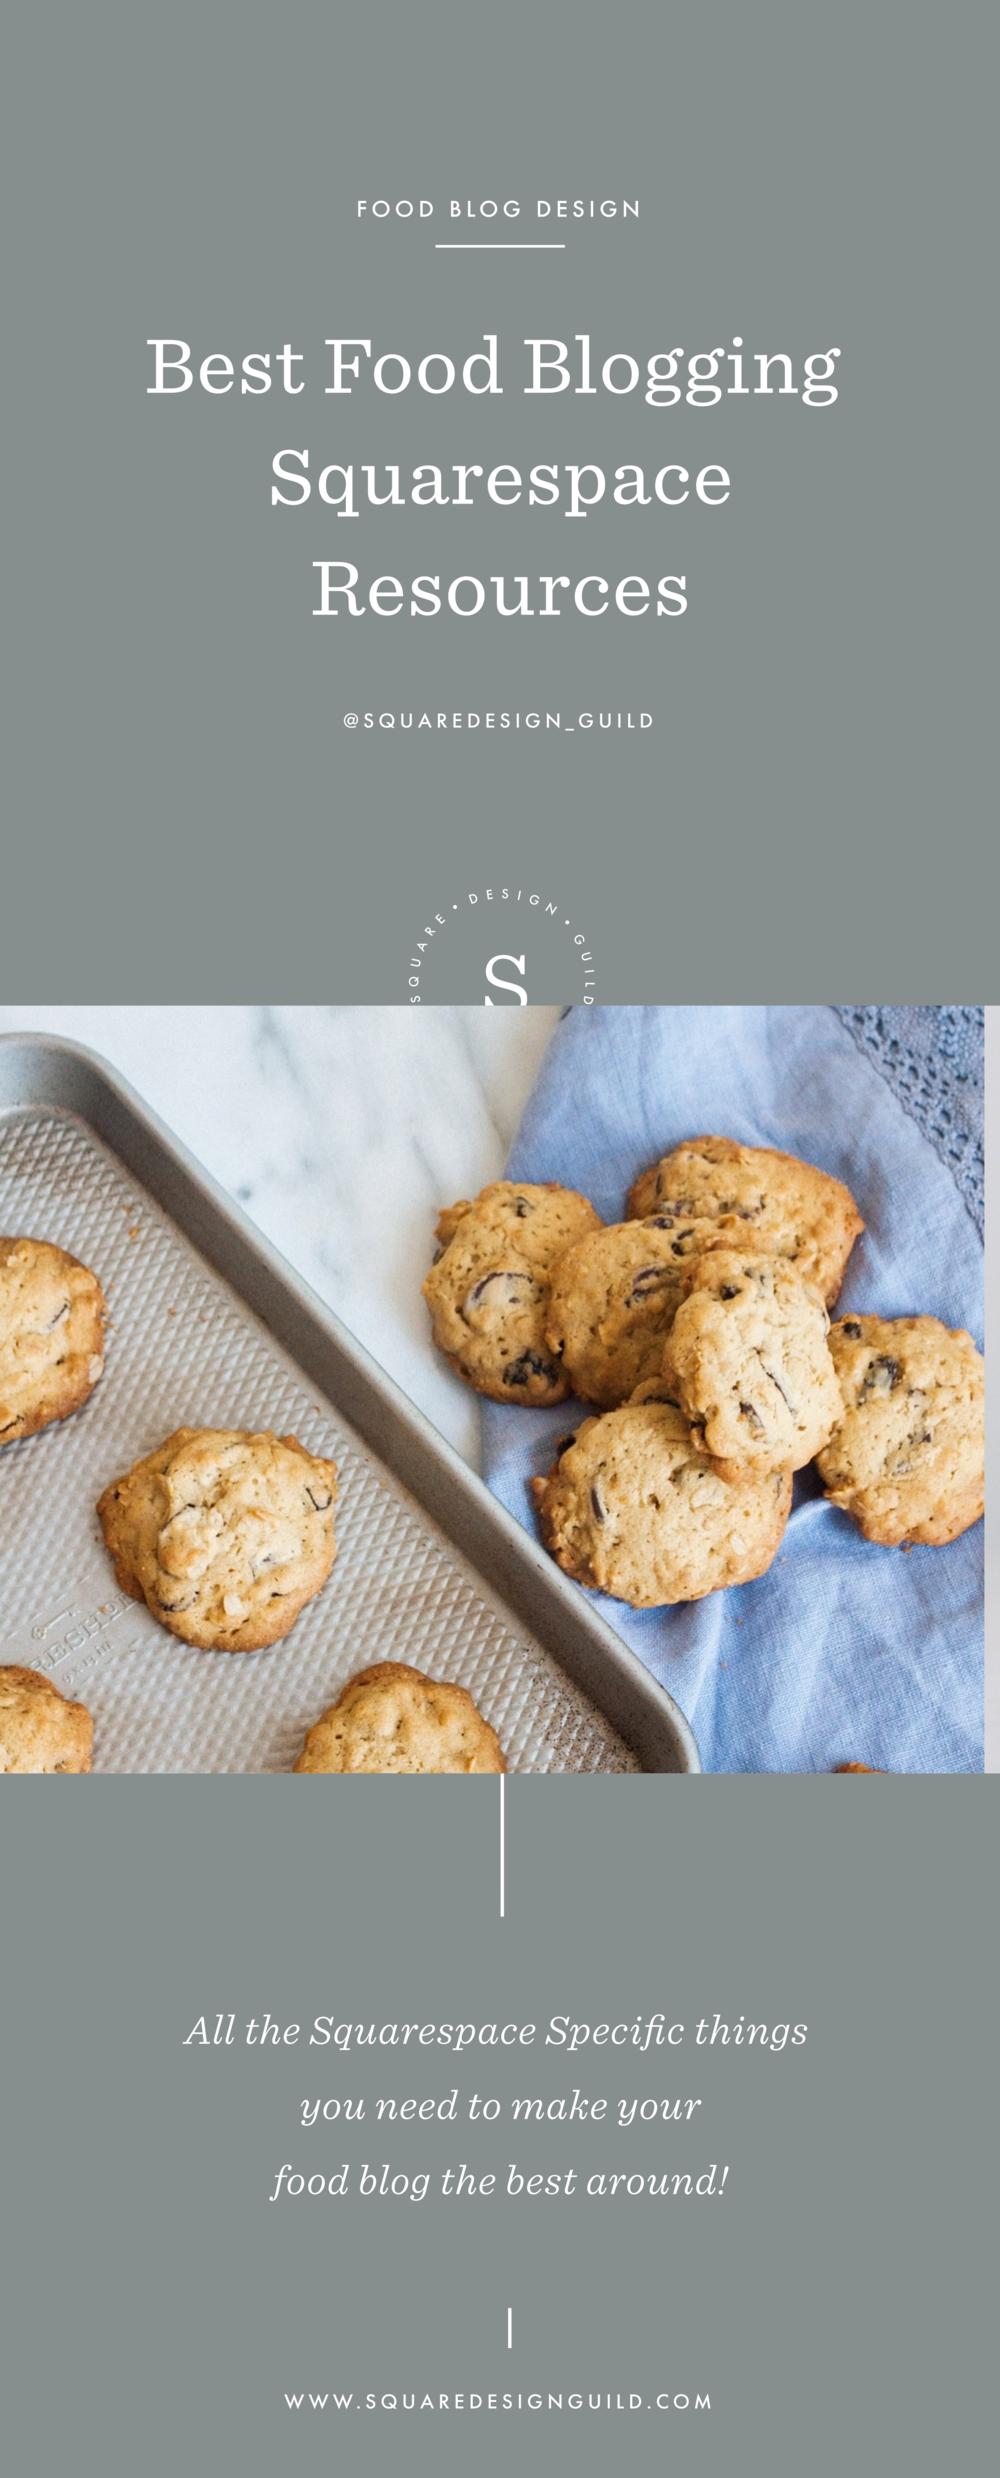 Squarespace Food Blogging Resources